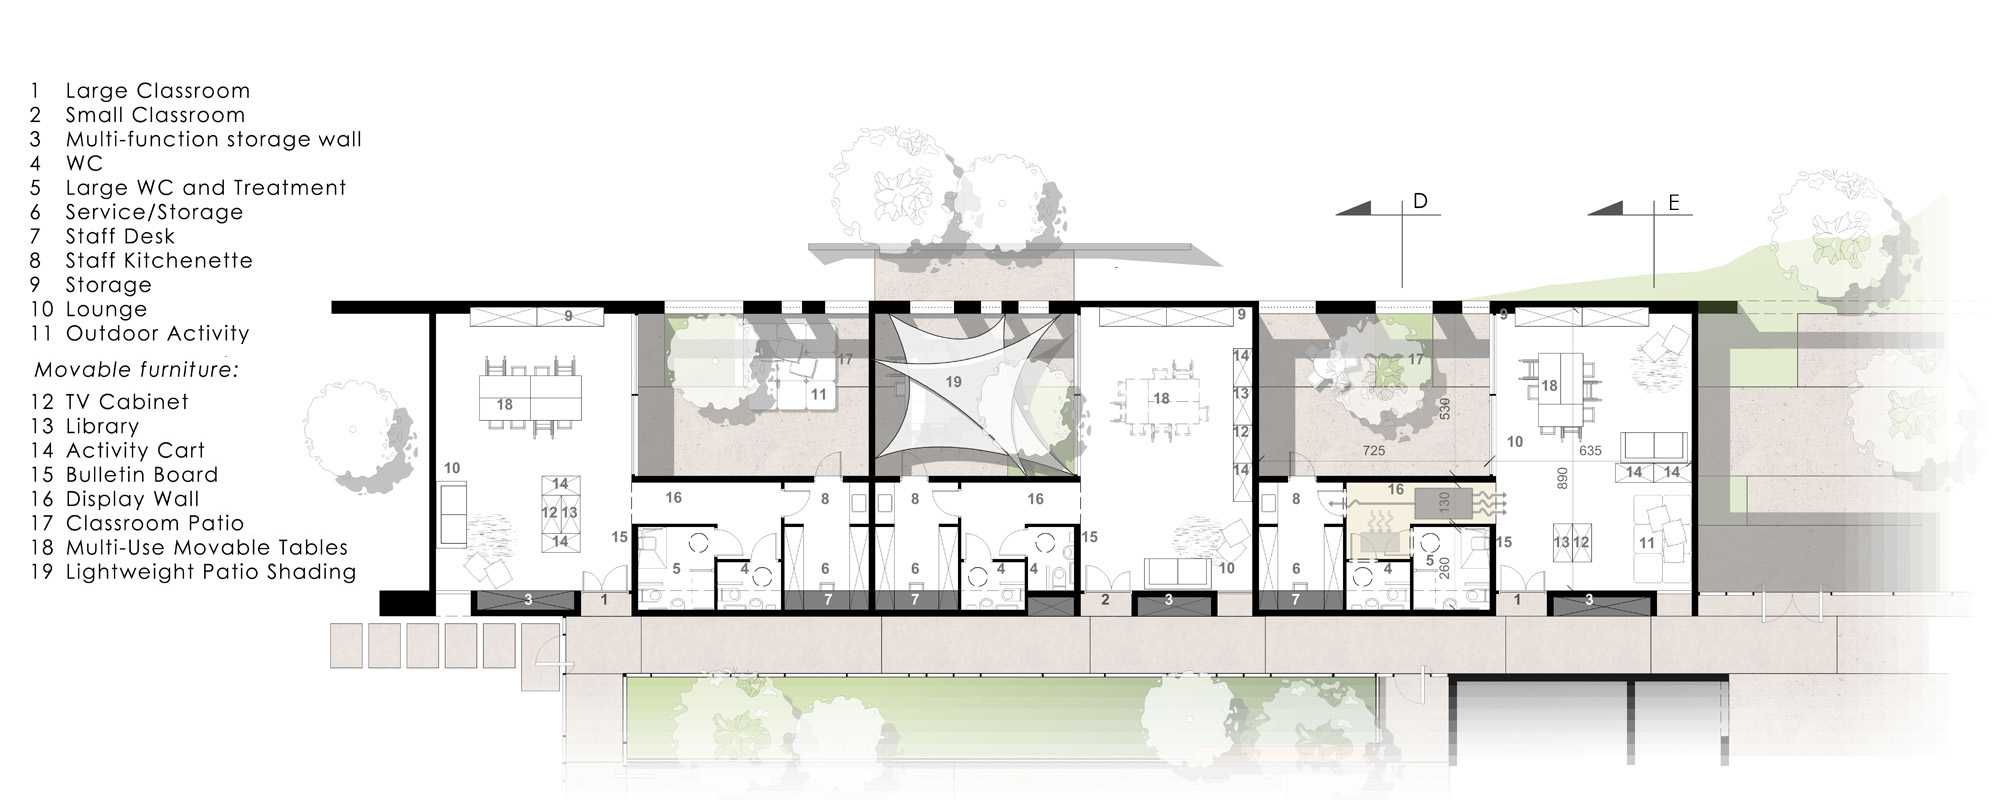 14 Plan Classrooms